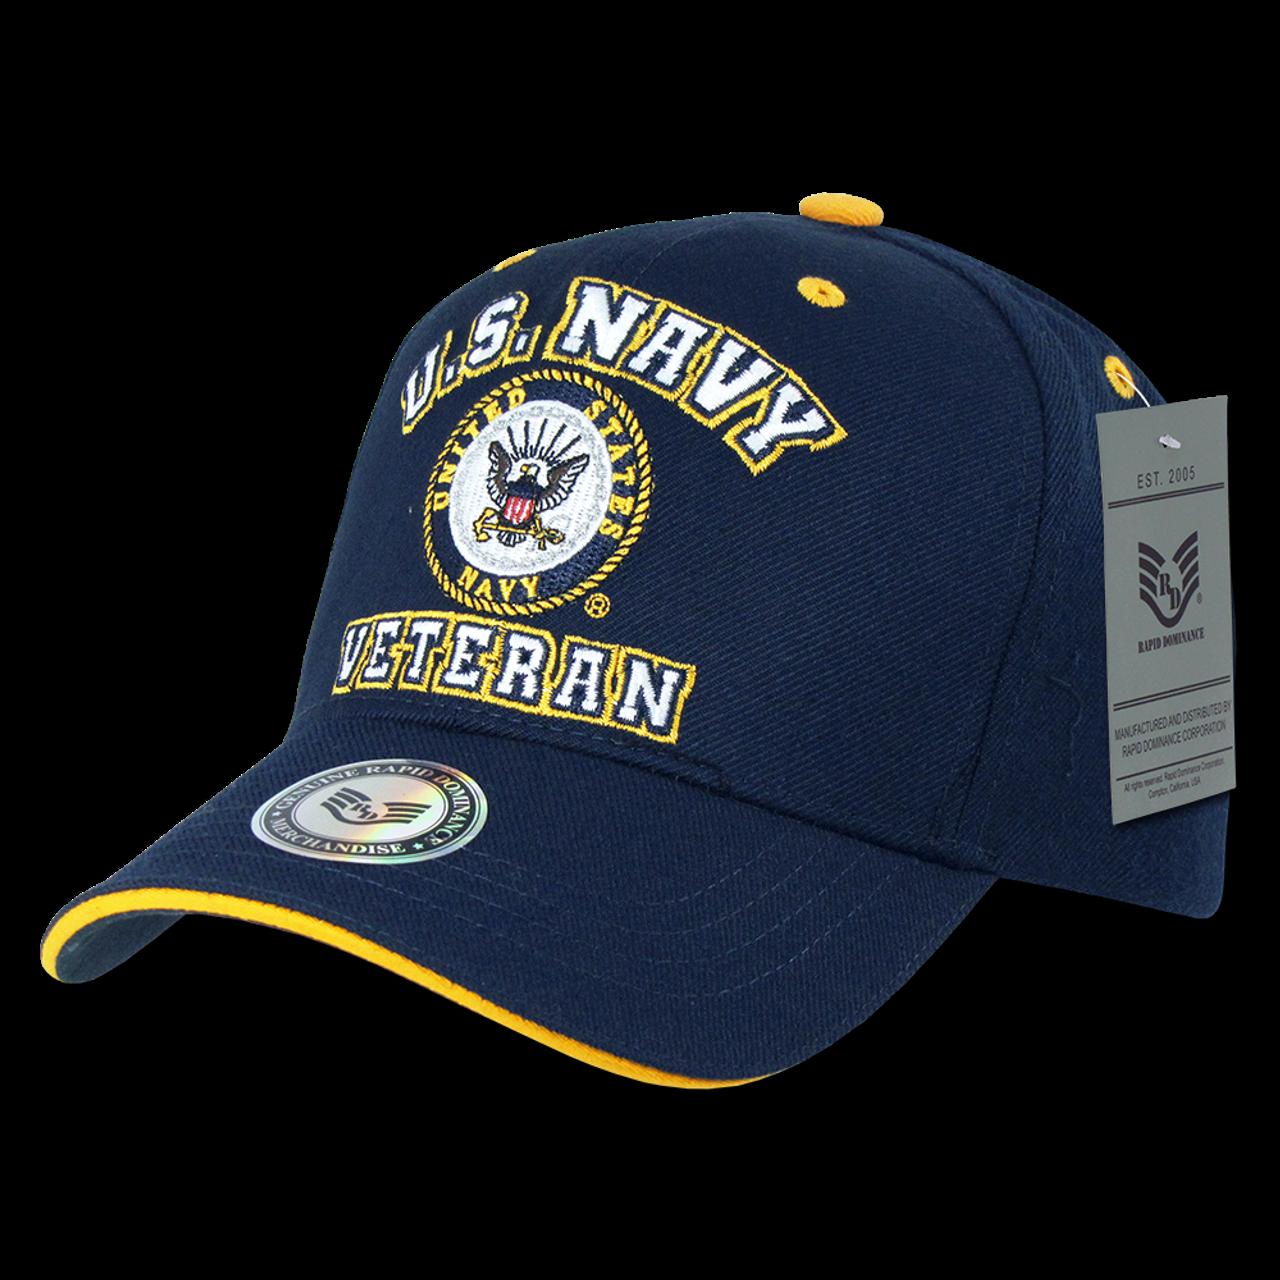 best sneakers c9abe 1bd57 ... ireland vet veteran cap u.s. navy navy usmilitaryhats 43866 8ba55